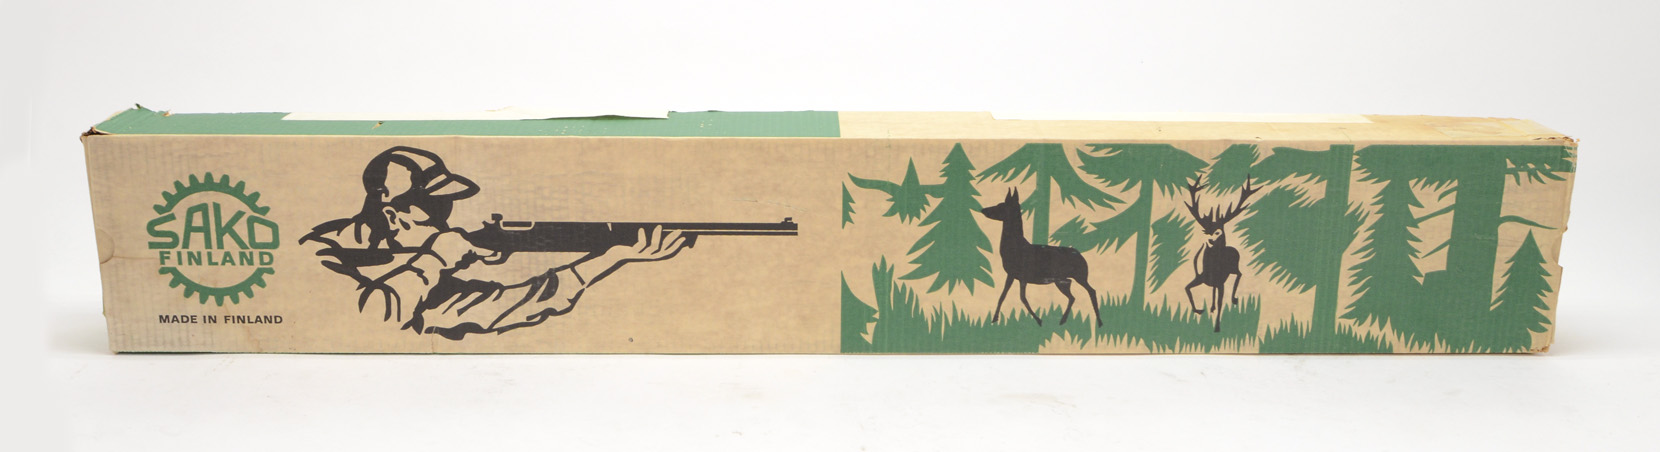 Vintage Sako Box